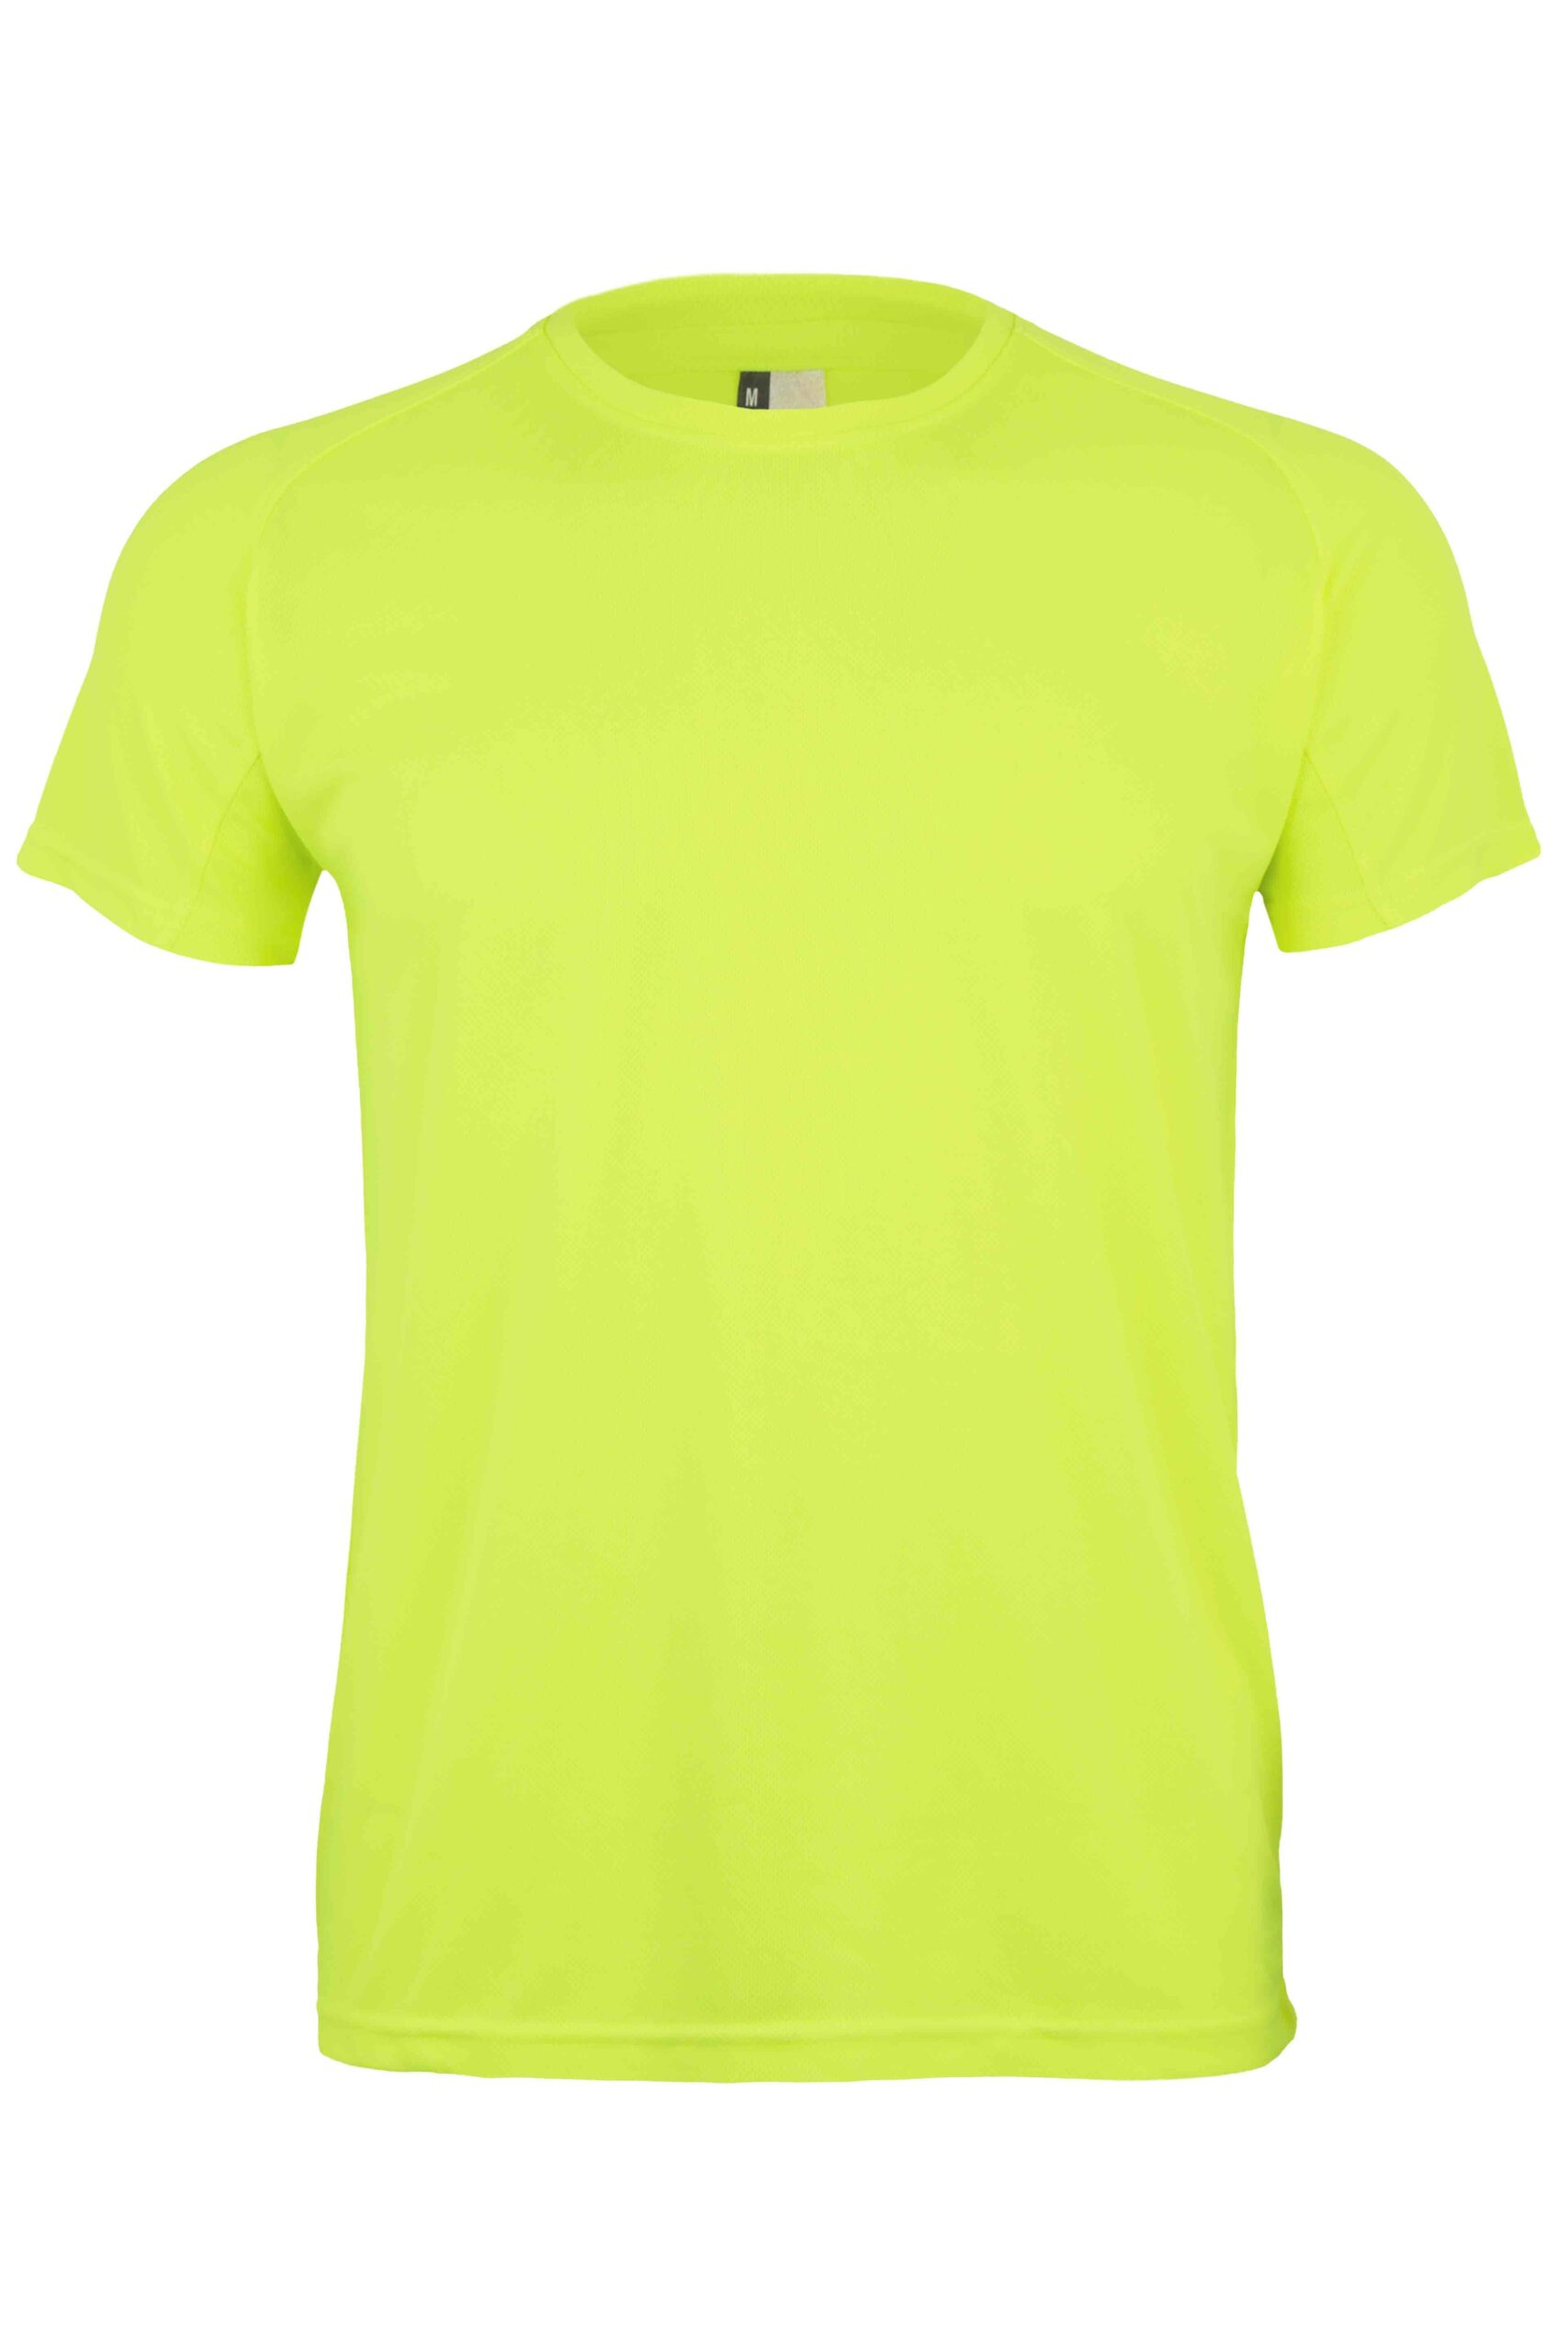 Mukua Mk521v Camiseta TÉcnica Manga Corta NiÑo FlÚor Yellow